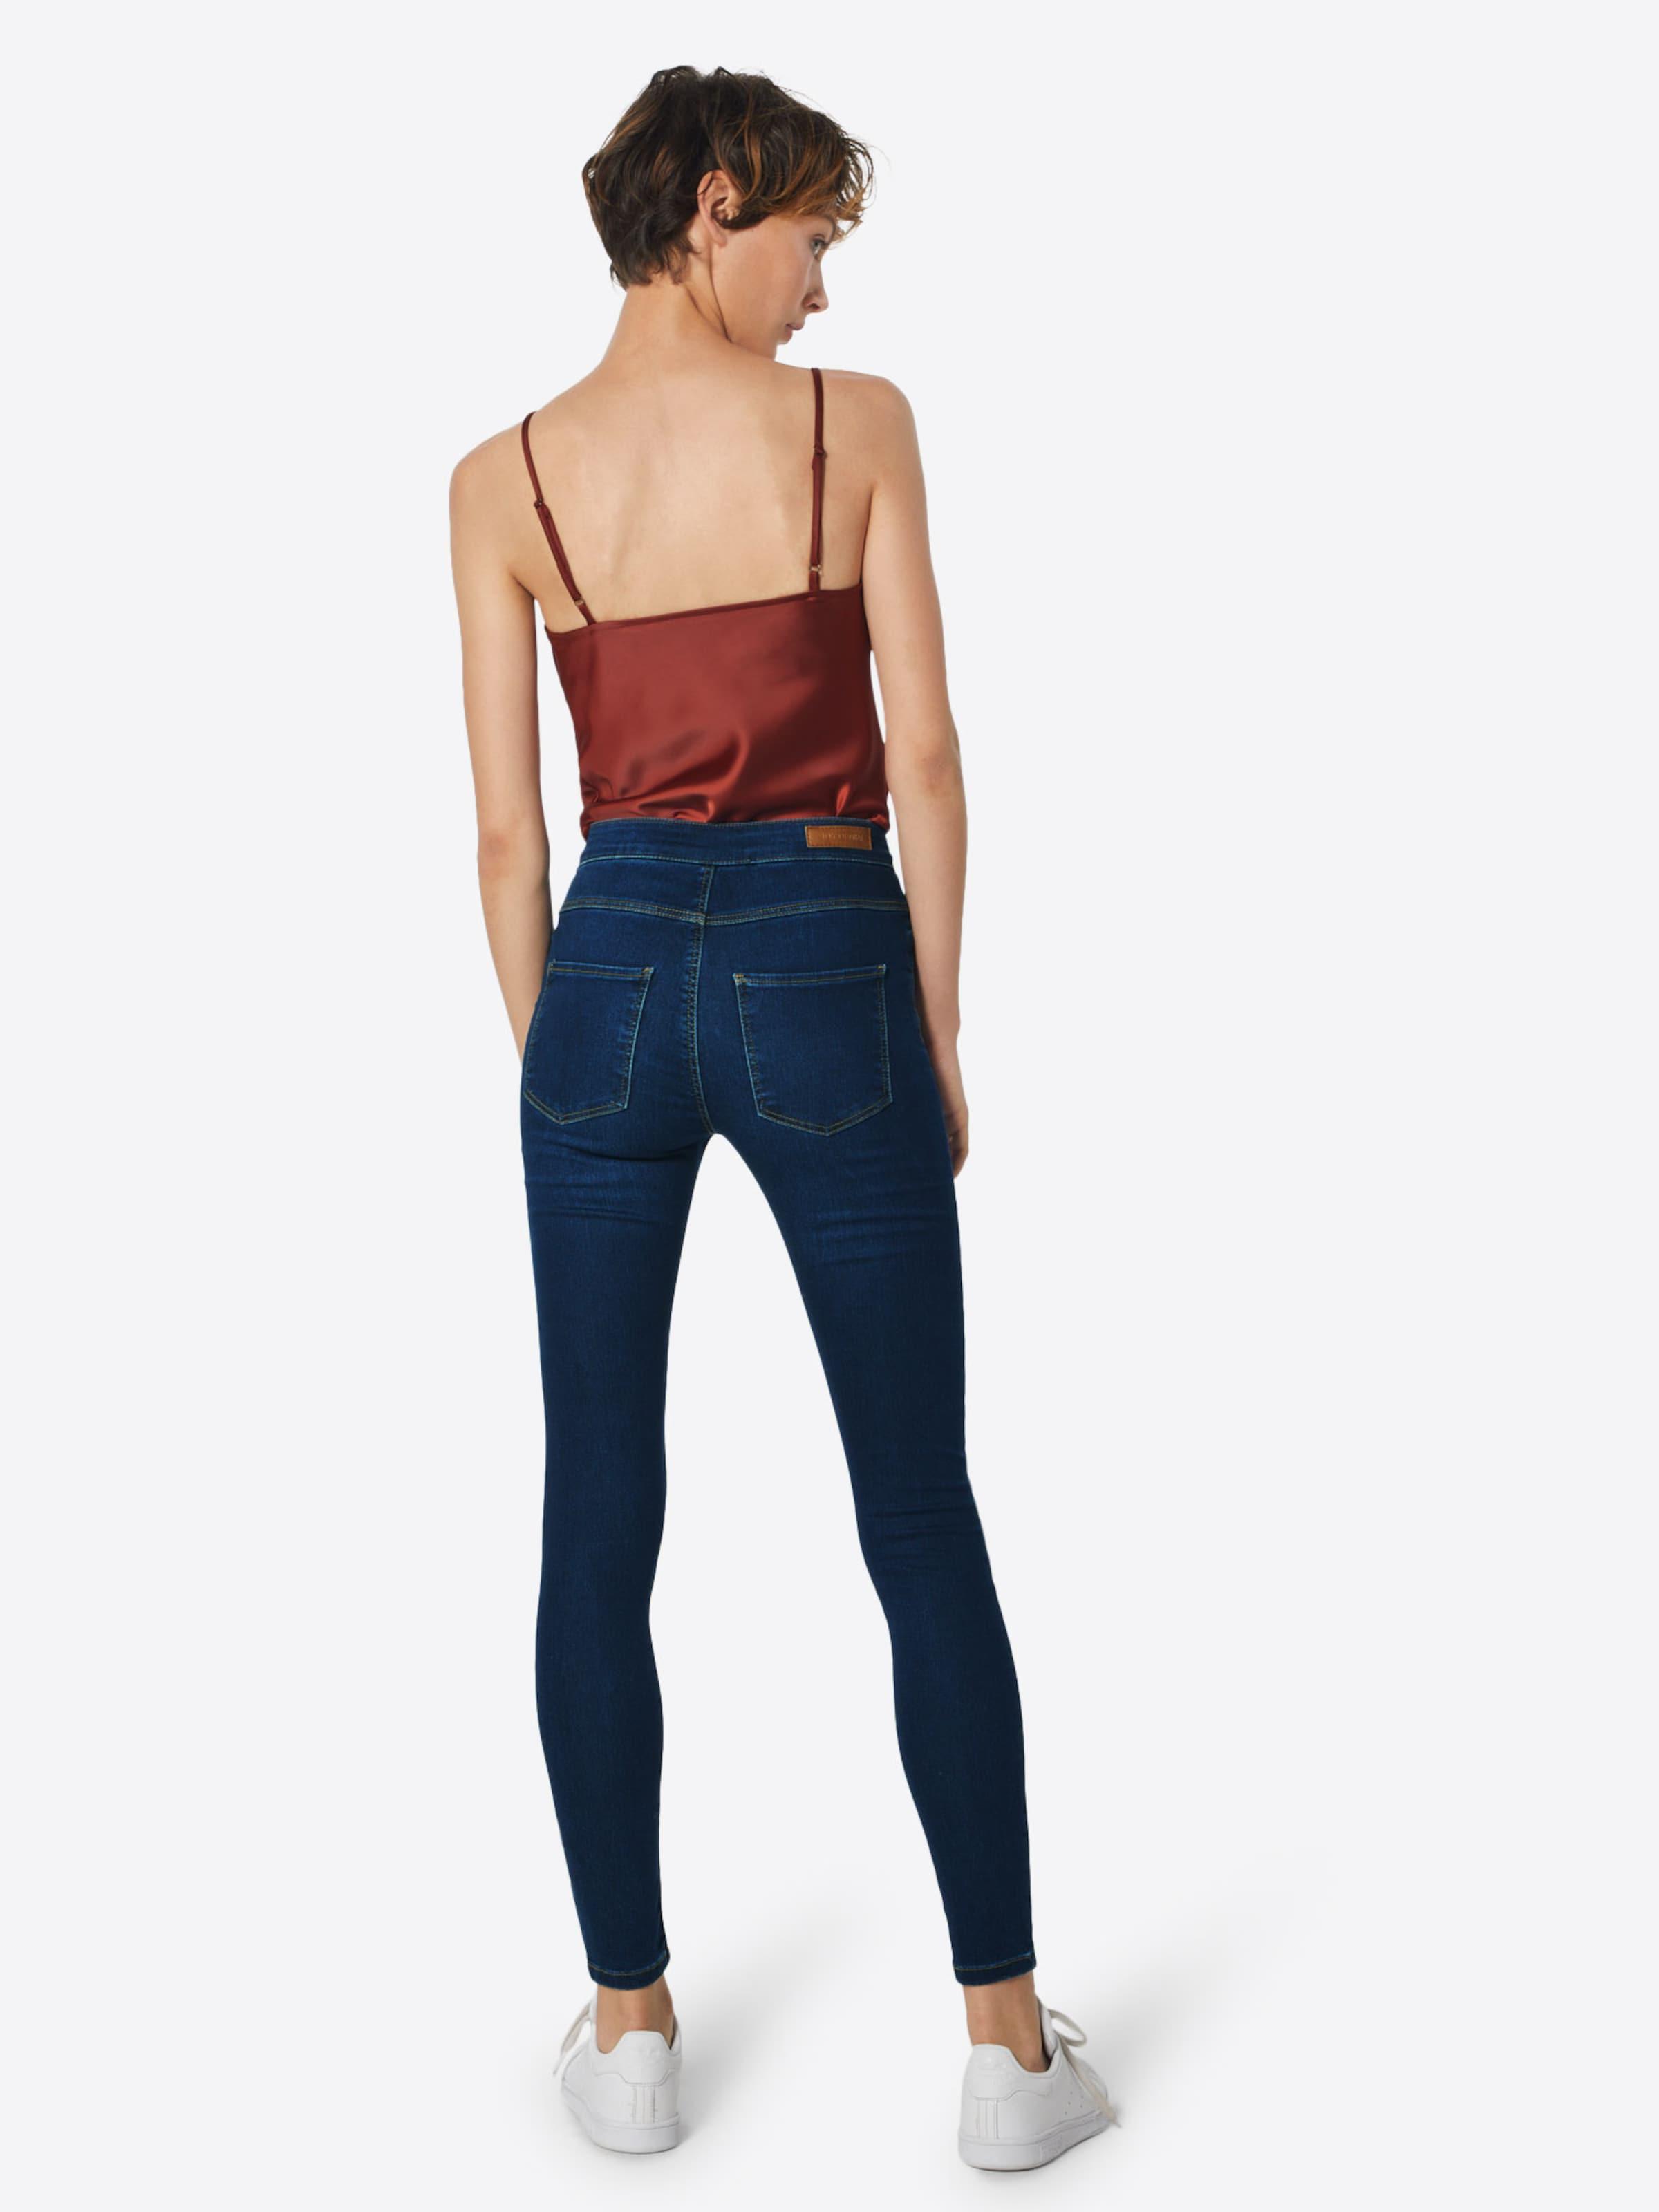 Yong Jeans In Dunkelblau Jacqueline De 0OkX8nwP